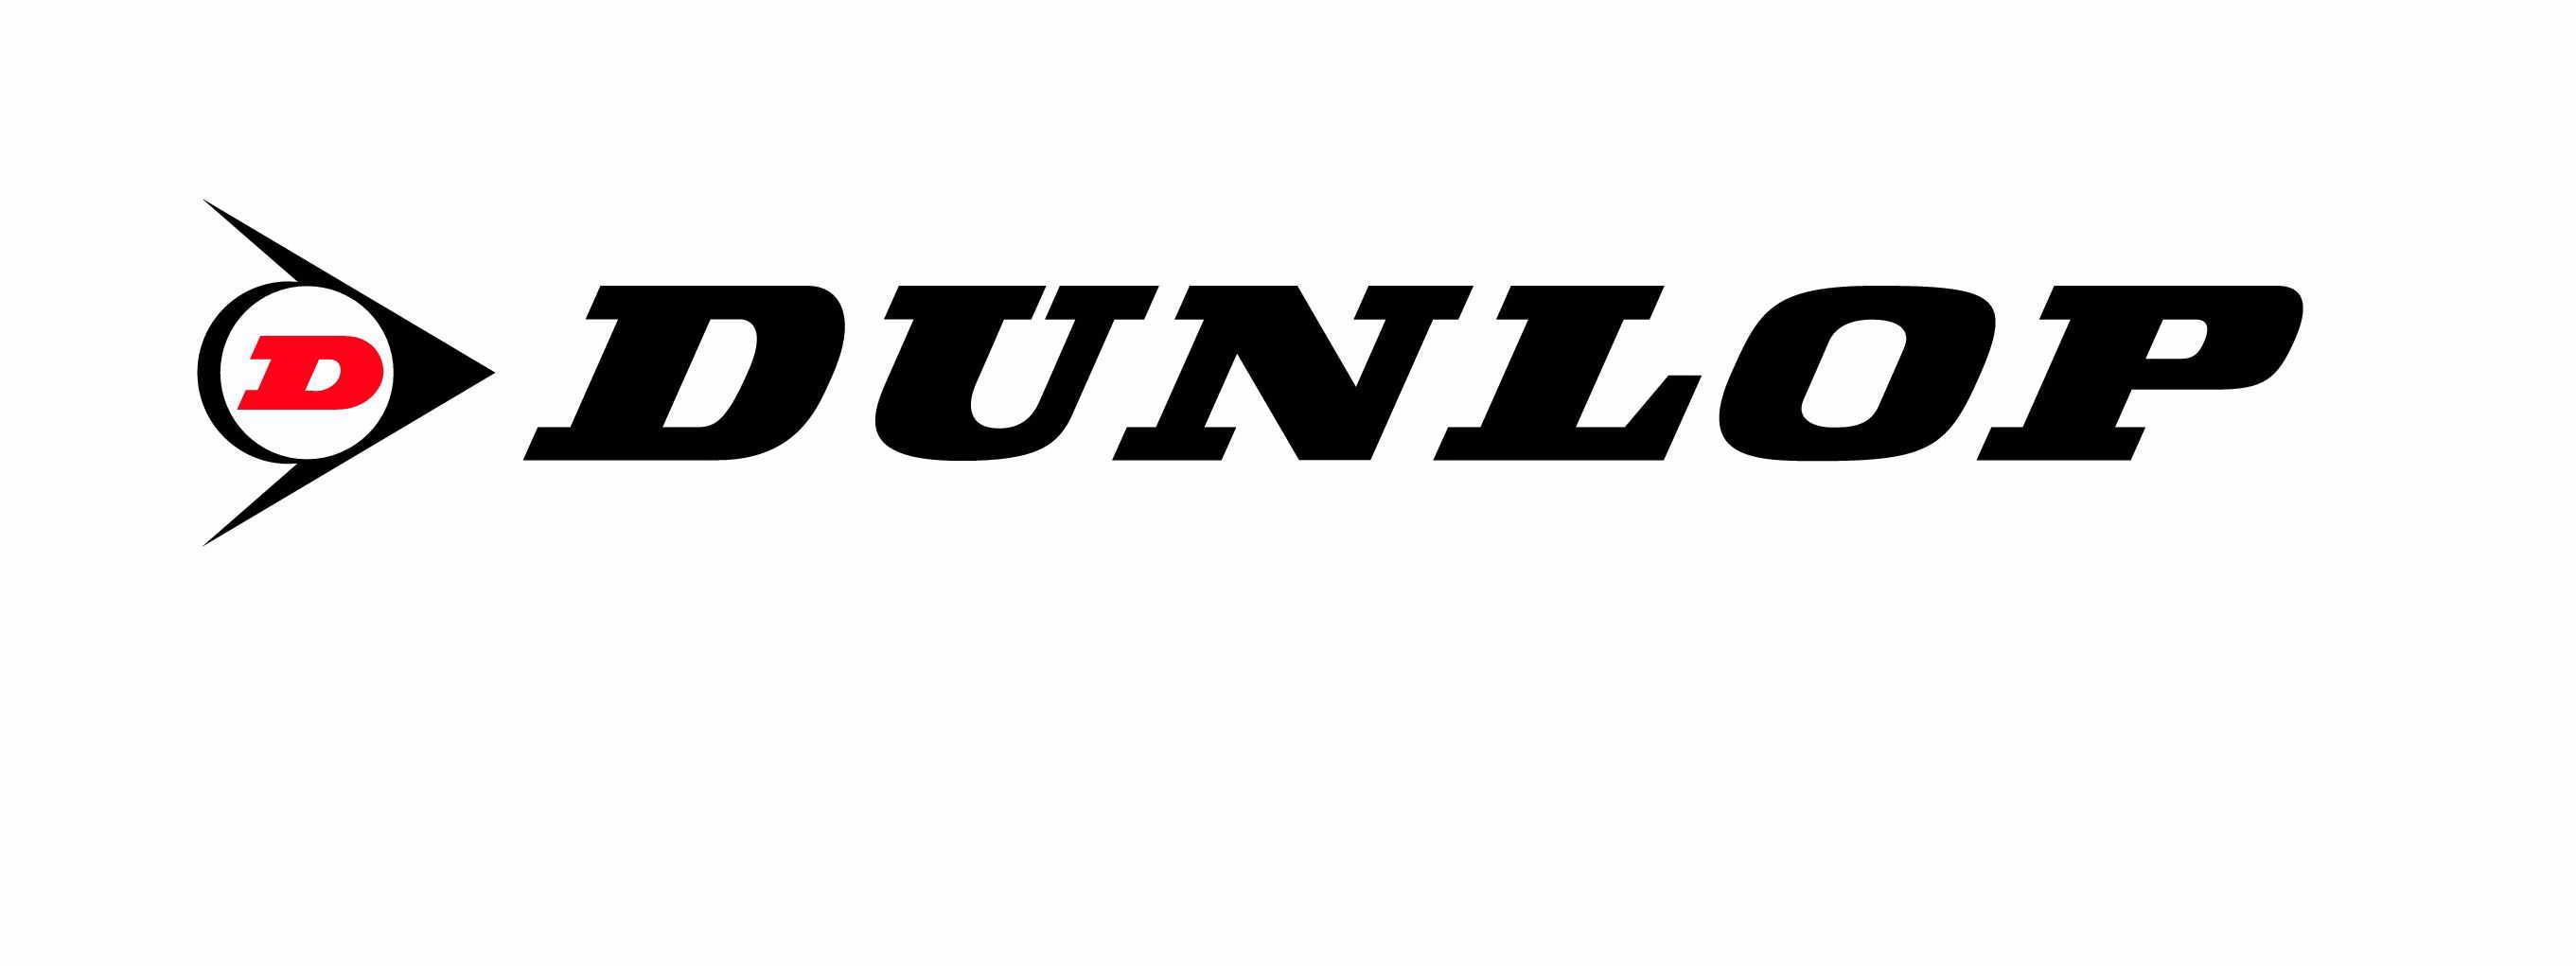 Dunlop PNG Transparent Dunlop.PNG Images..